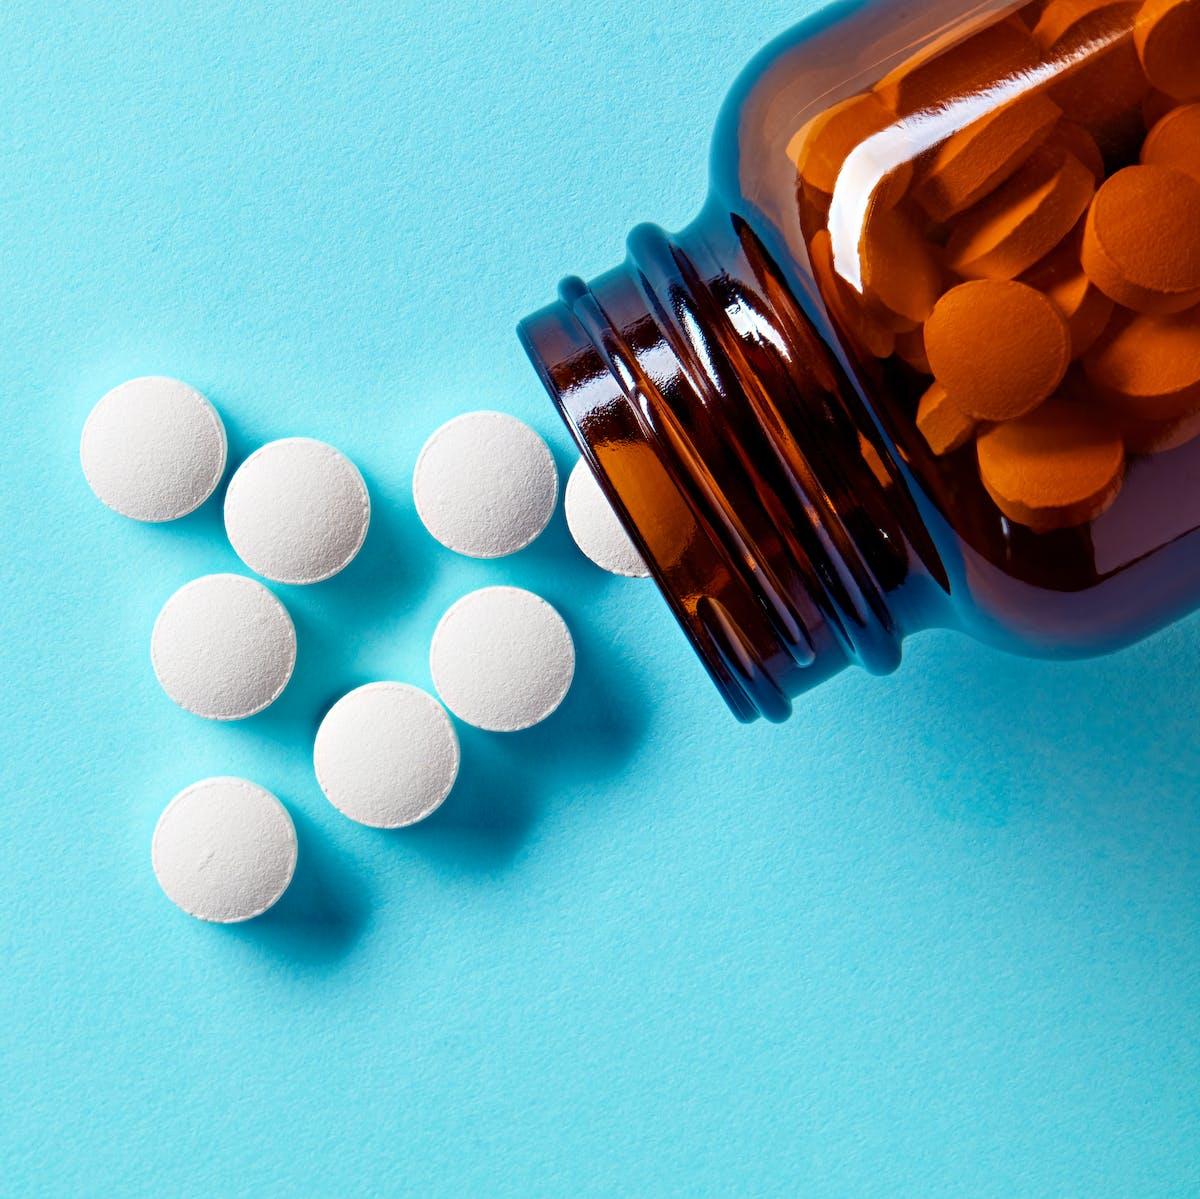 The honest reason your doctor won't prescribe you Xanax